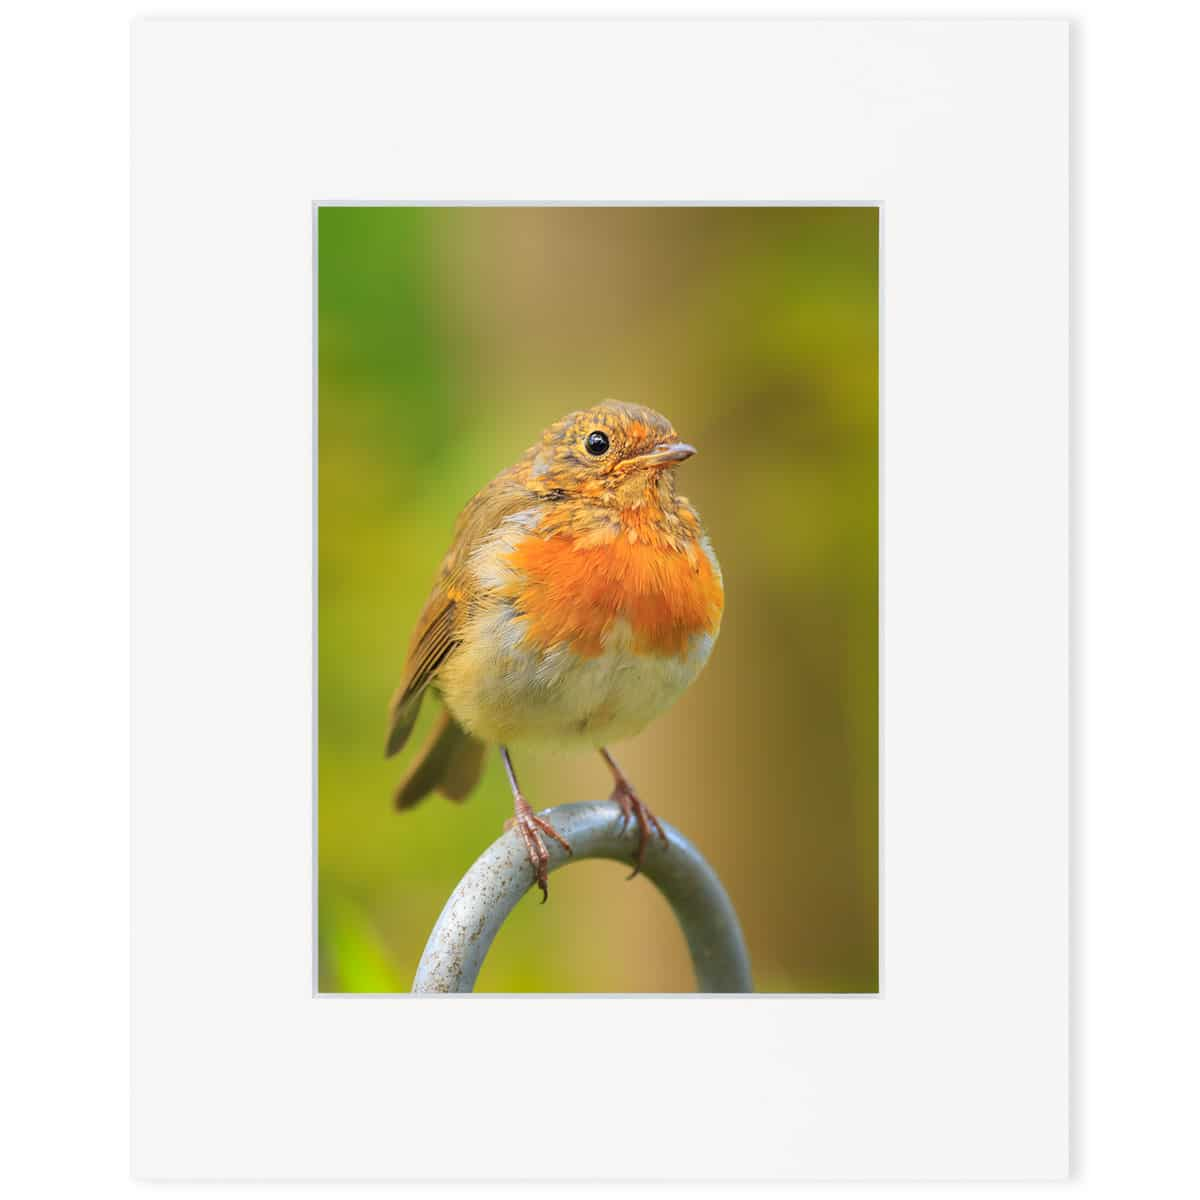 "A juvenile Robin 8"" x 10"" print"